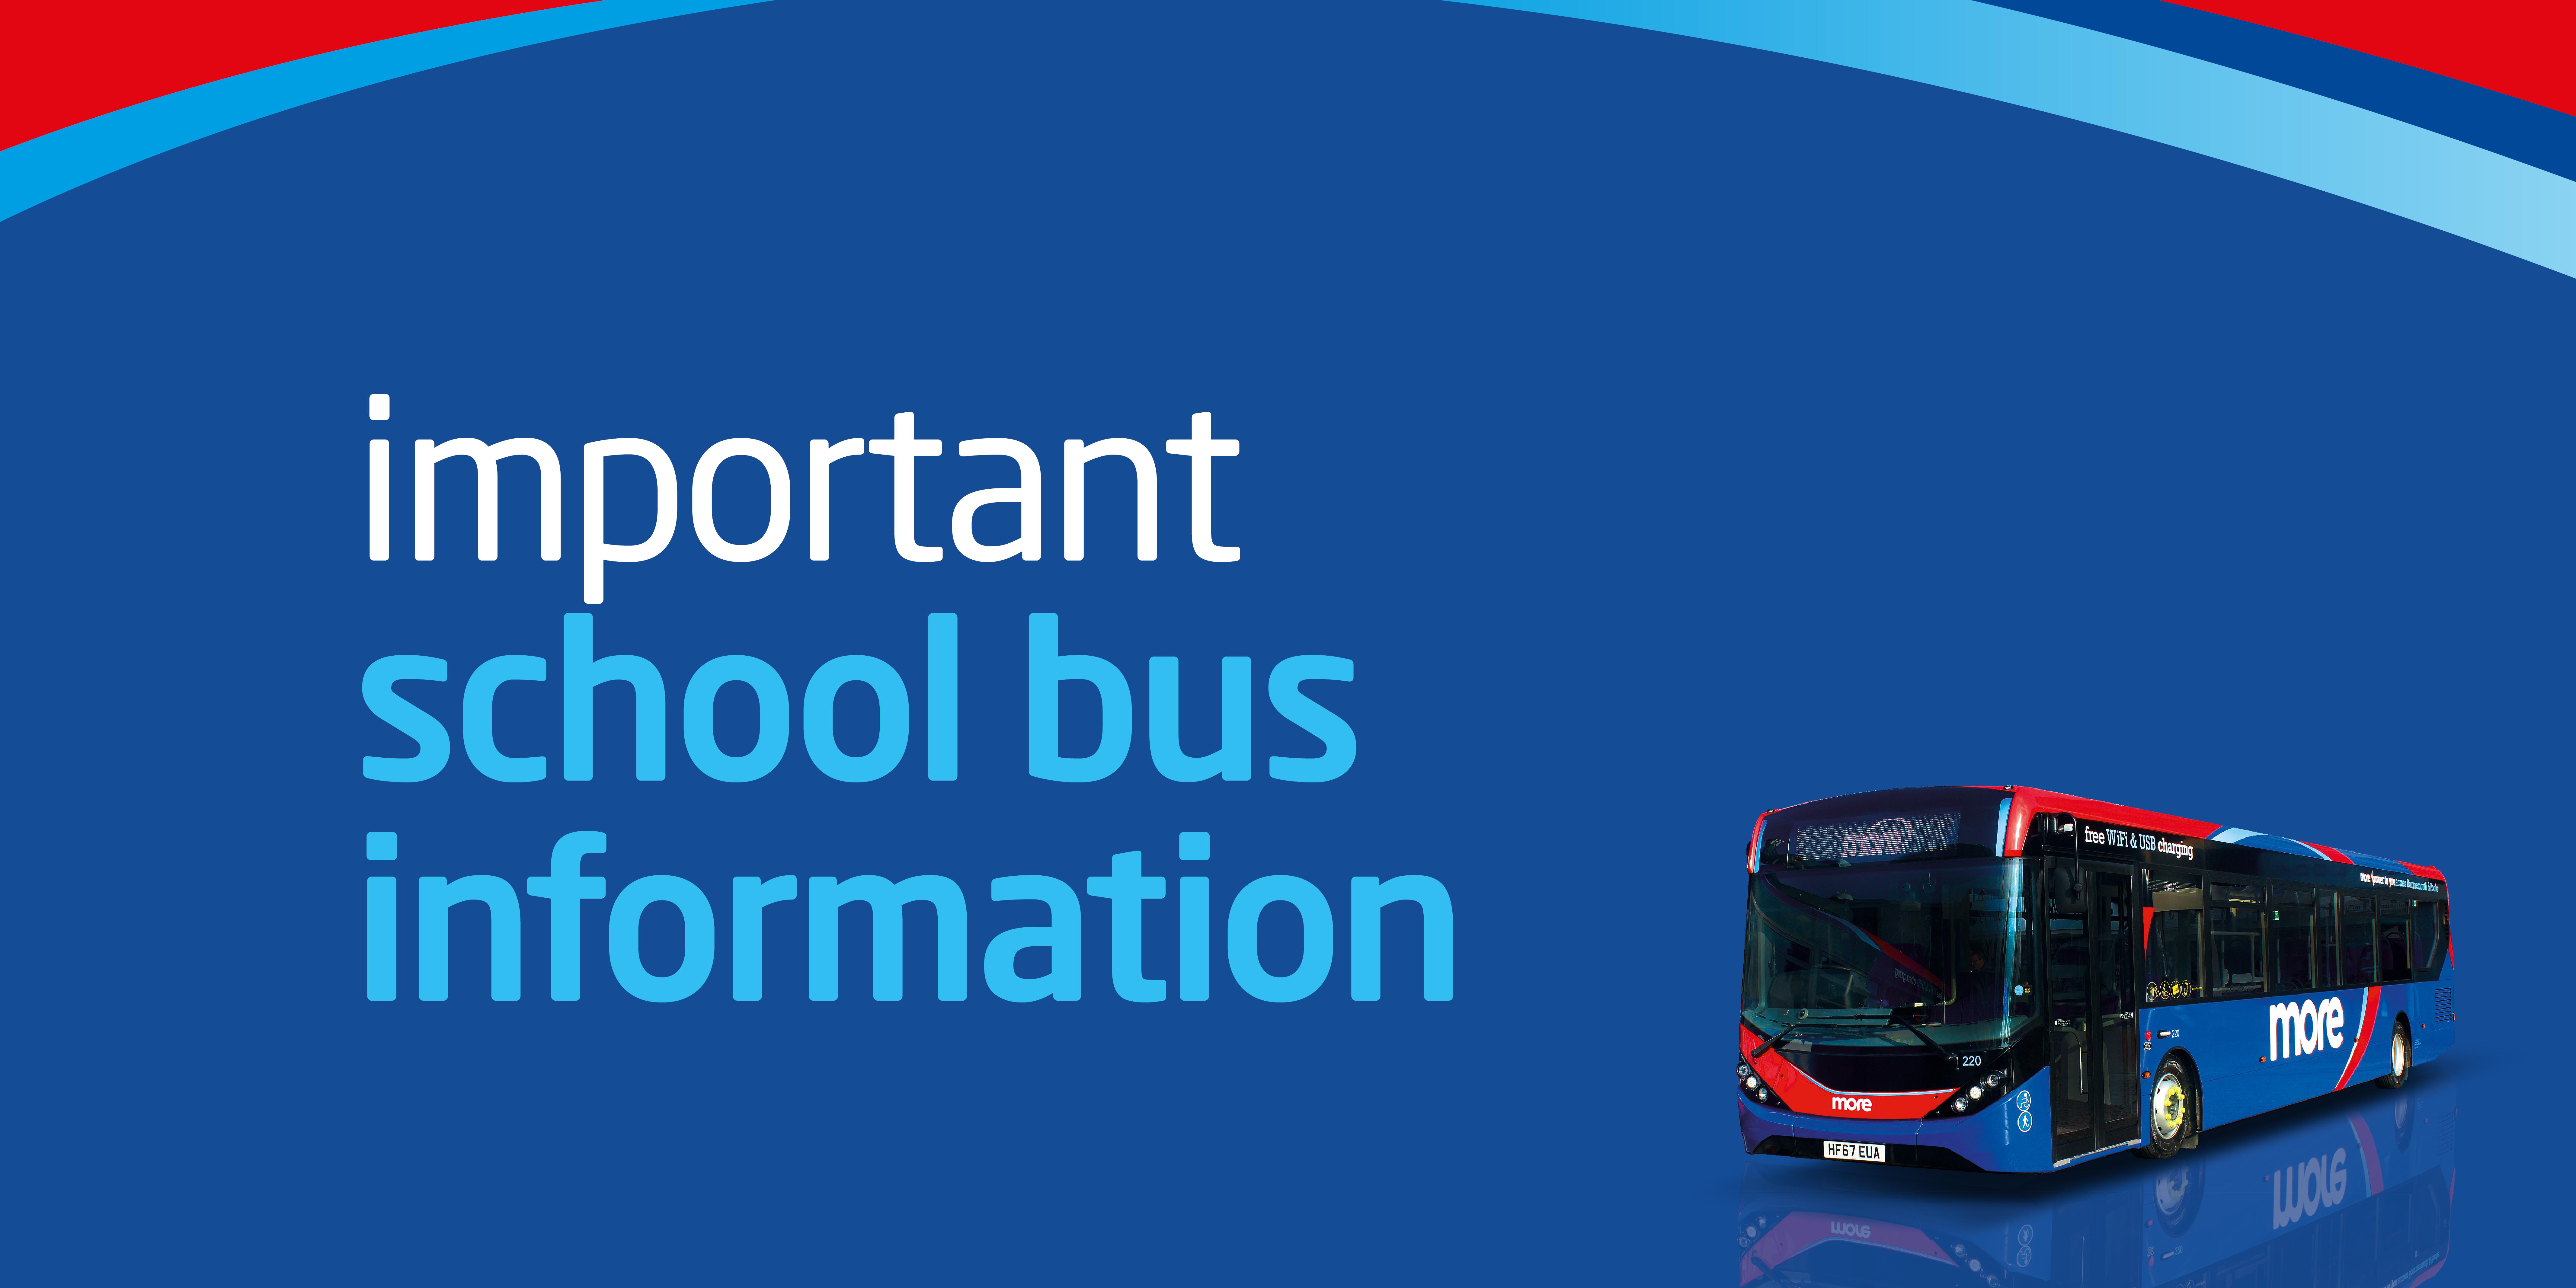 Image reading 'important school bus information'